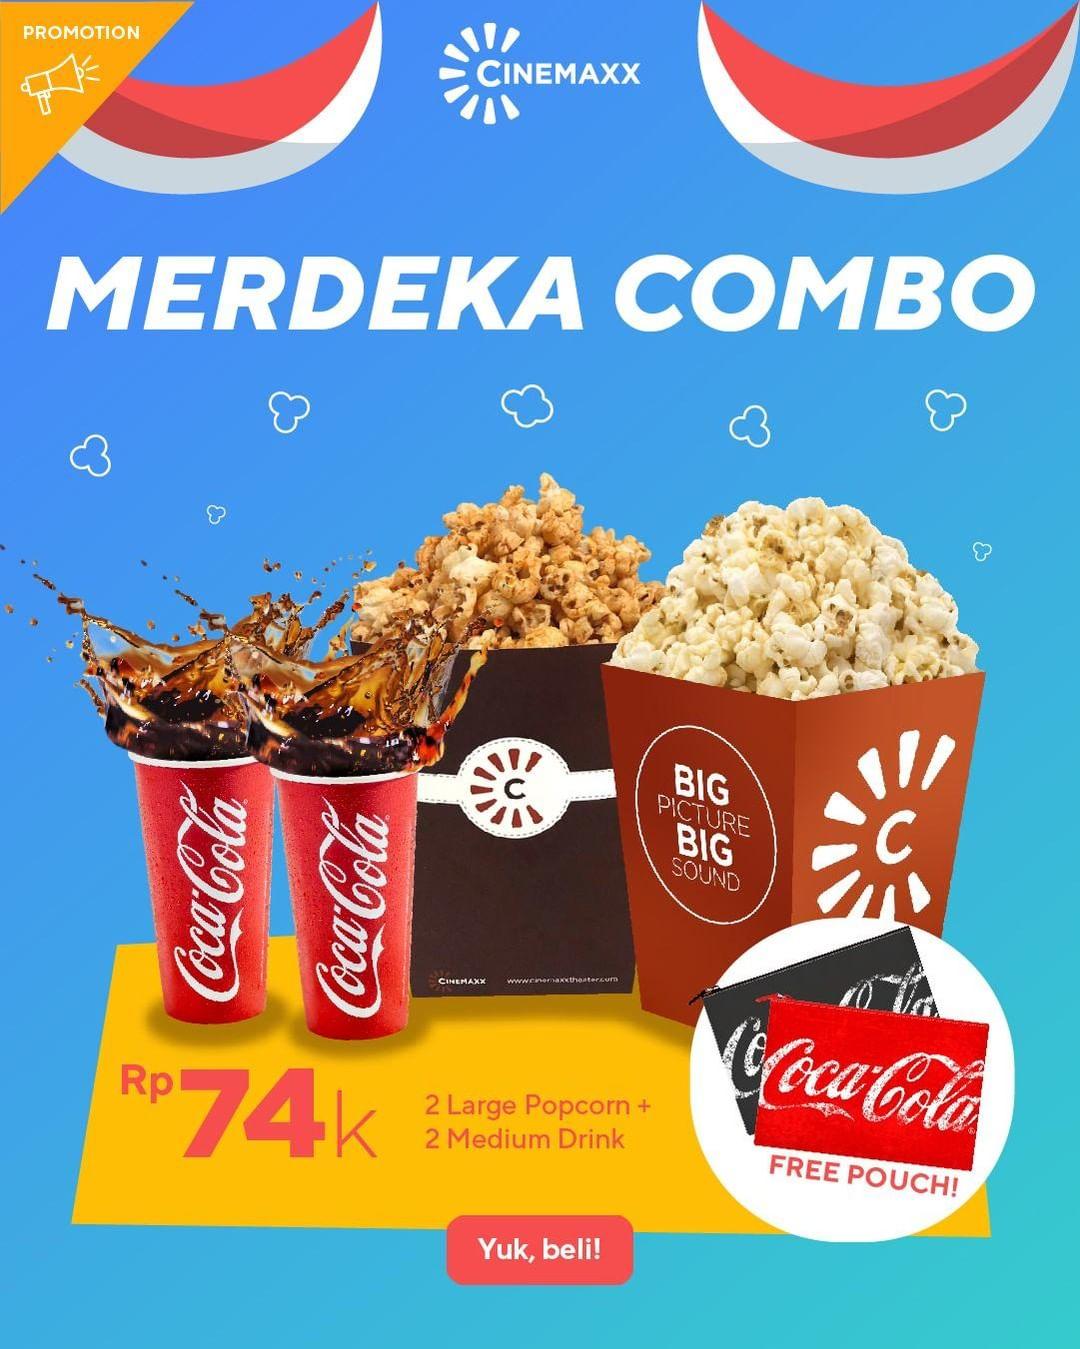 CINEMAXX MERDEKA COMBO hanya Rp.74.000